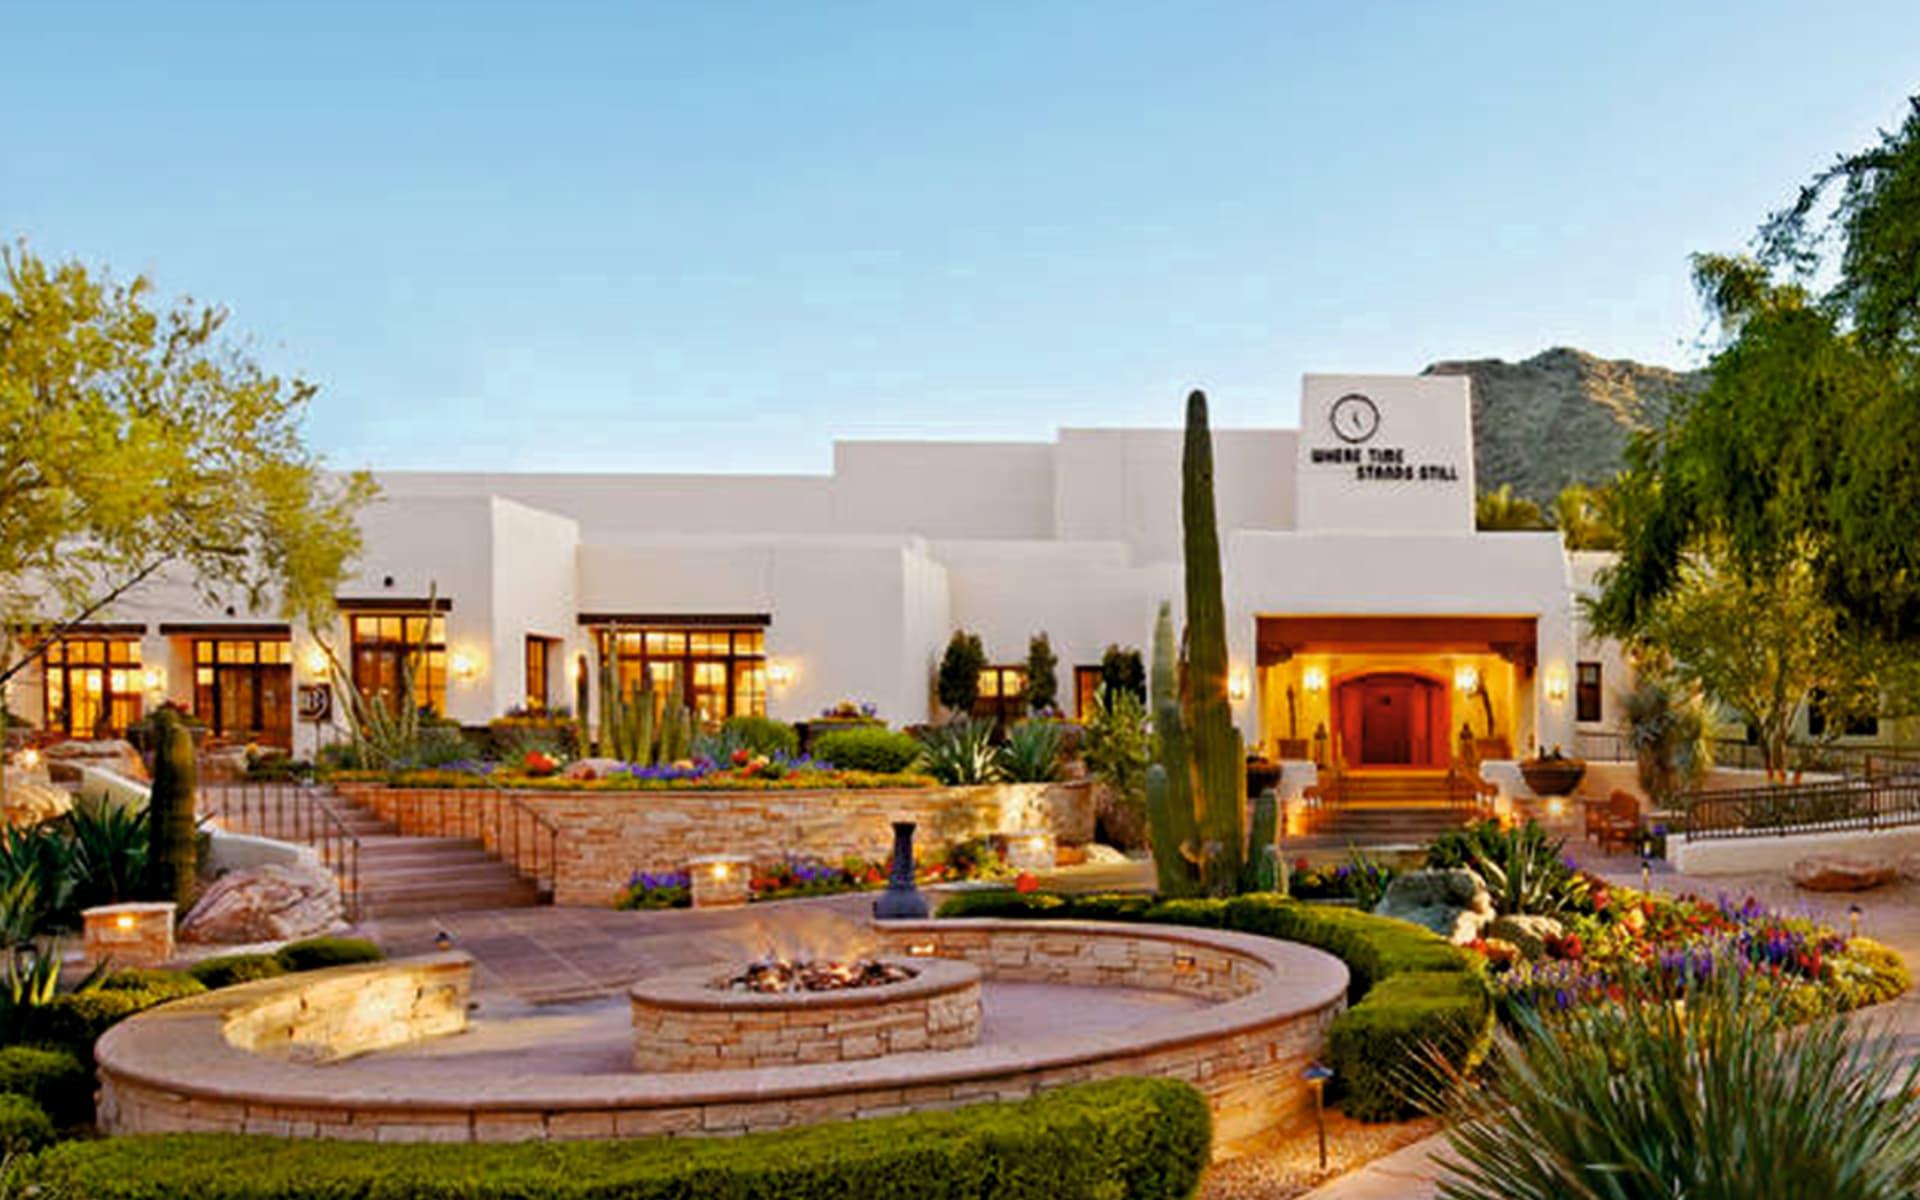 JW Marriott Scottsdale Camelback Inn Resort & Spa: facilities jw marriott scottsdale camelback inn resort and spa gartenanlage